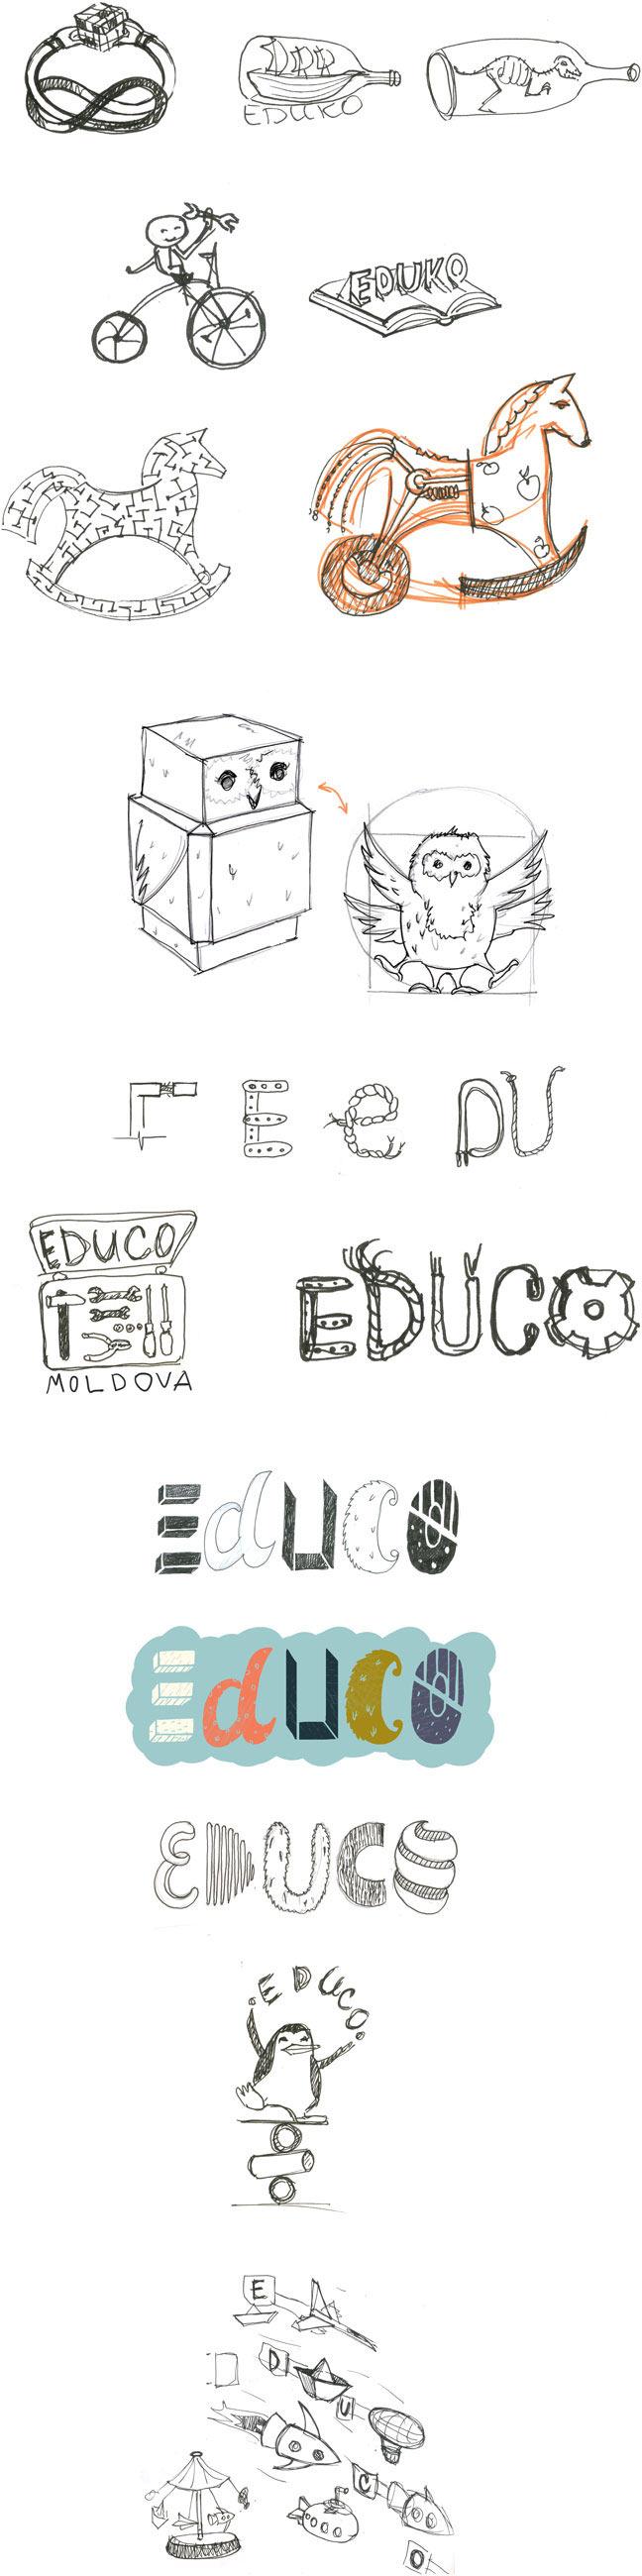 educo-process-01